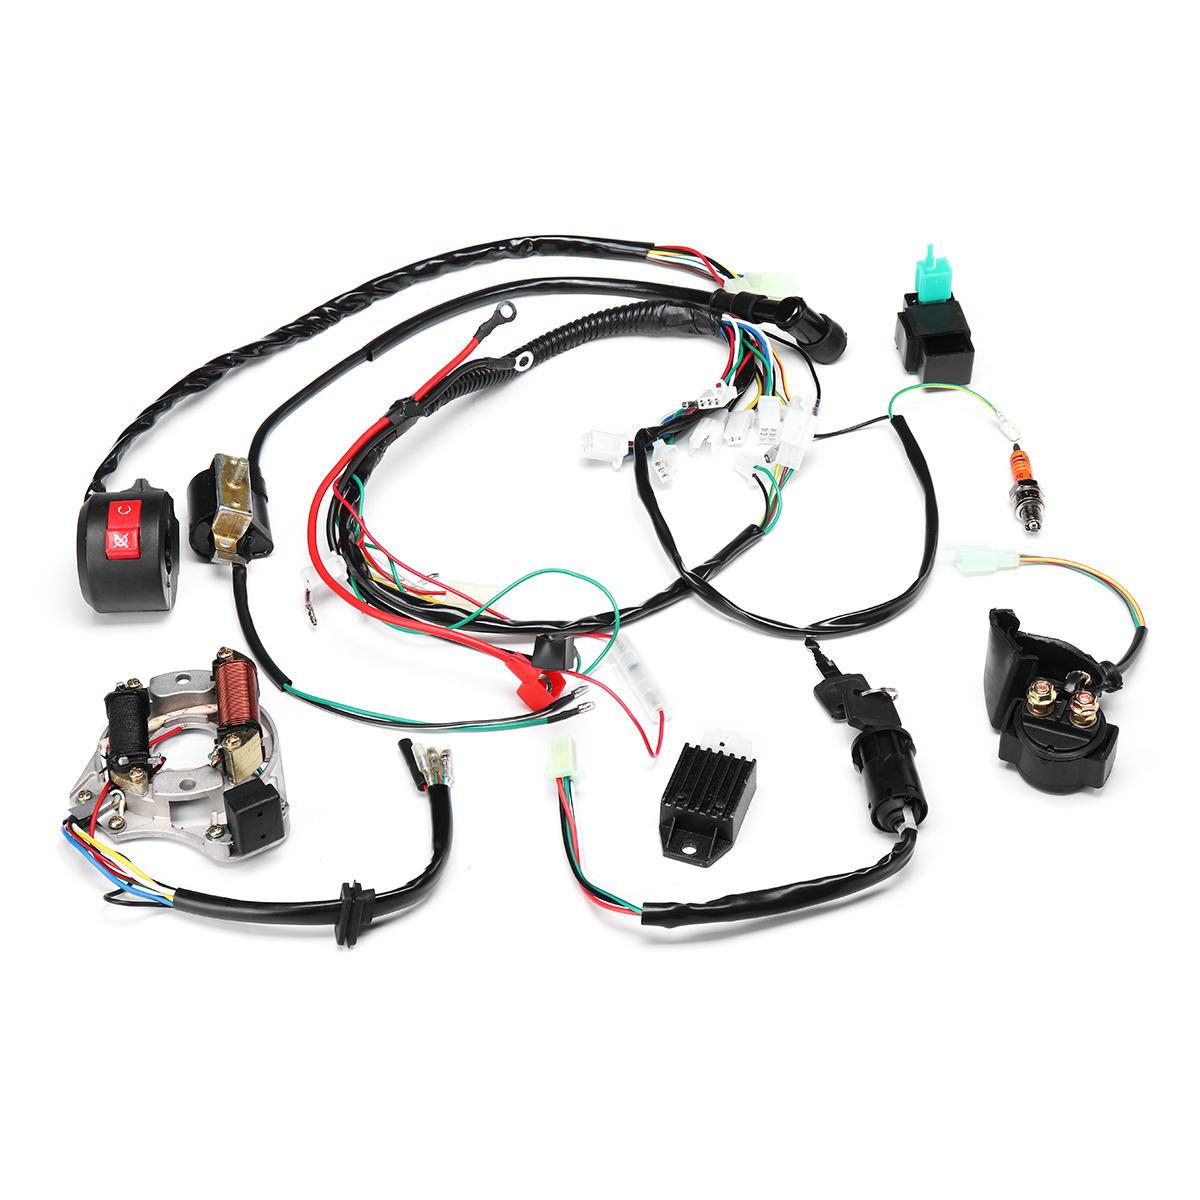 50cc 70cc 90cc 110cc 125cc Atv Ignition Coil Electric Wiring Diagram